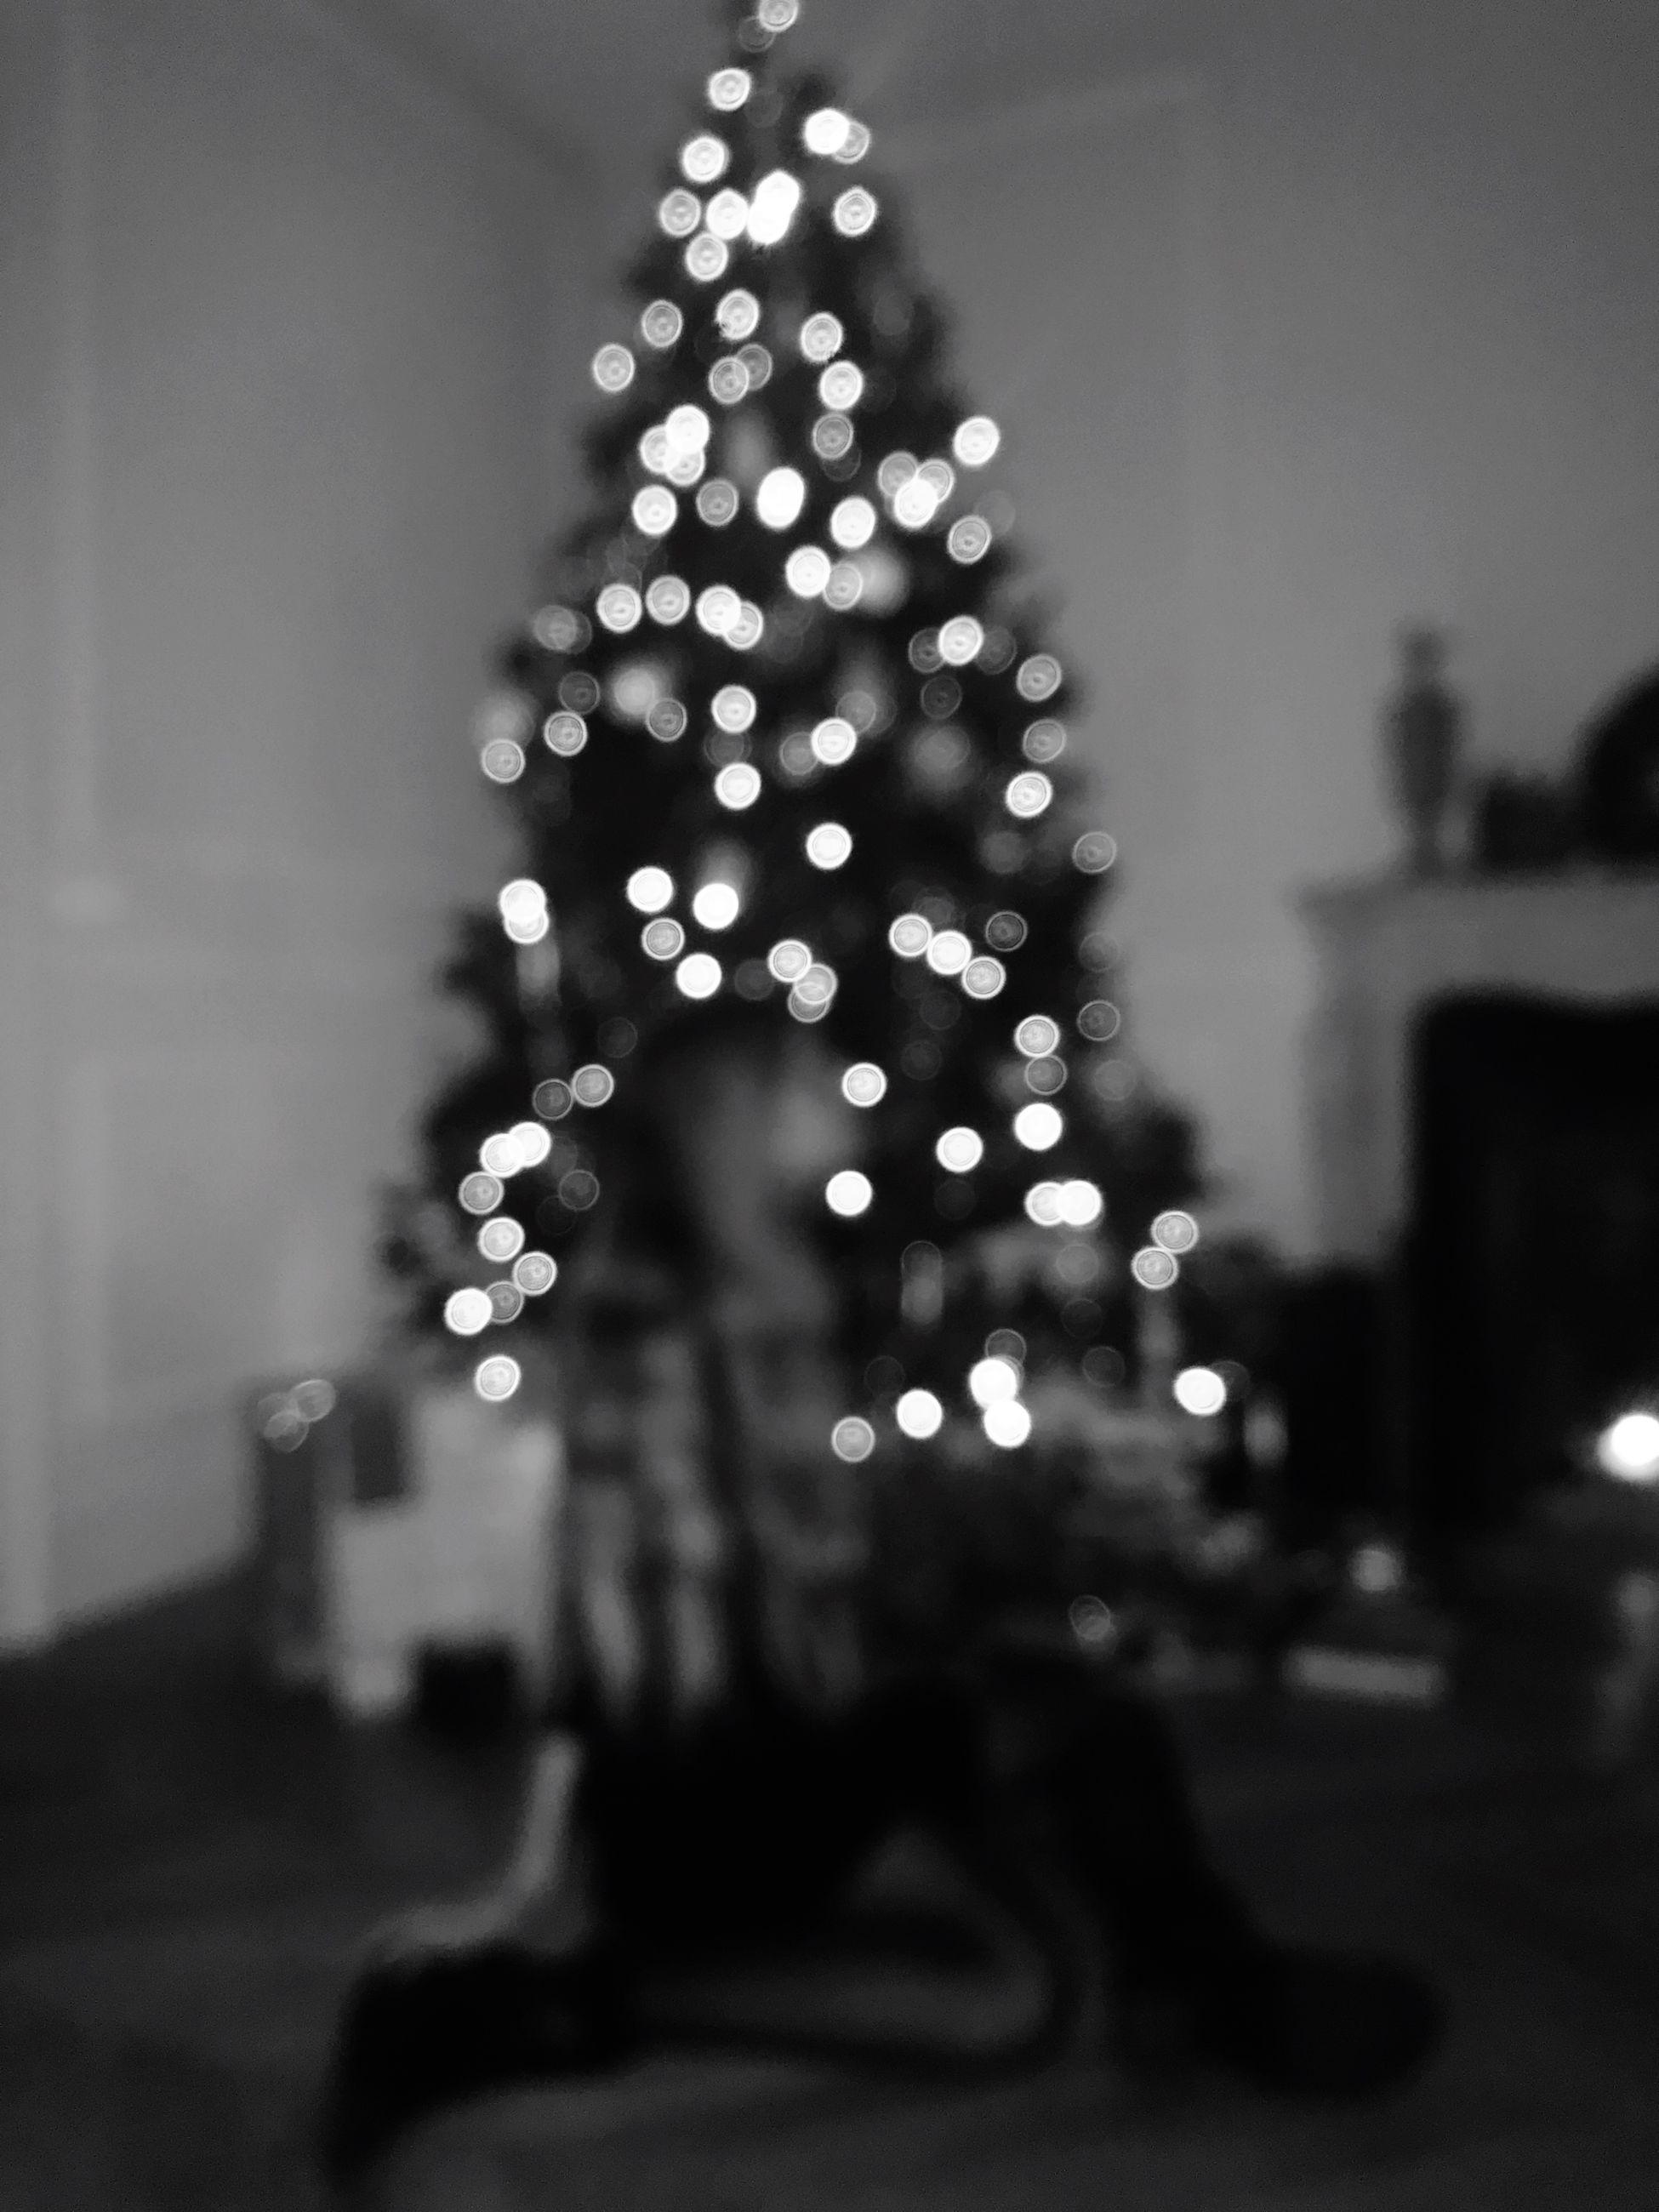 christmas, christmas tree, illuminated, christmas decoration, celebration, christmas lights, night, focus on foreground, tree, defocused, holiday - event, christmas ornament, tree topper, indoors, no people, close-up